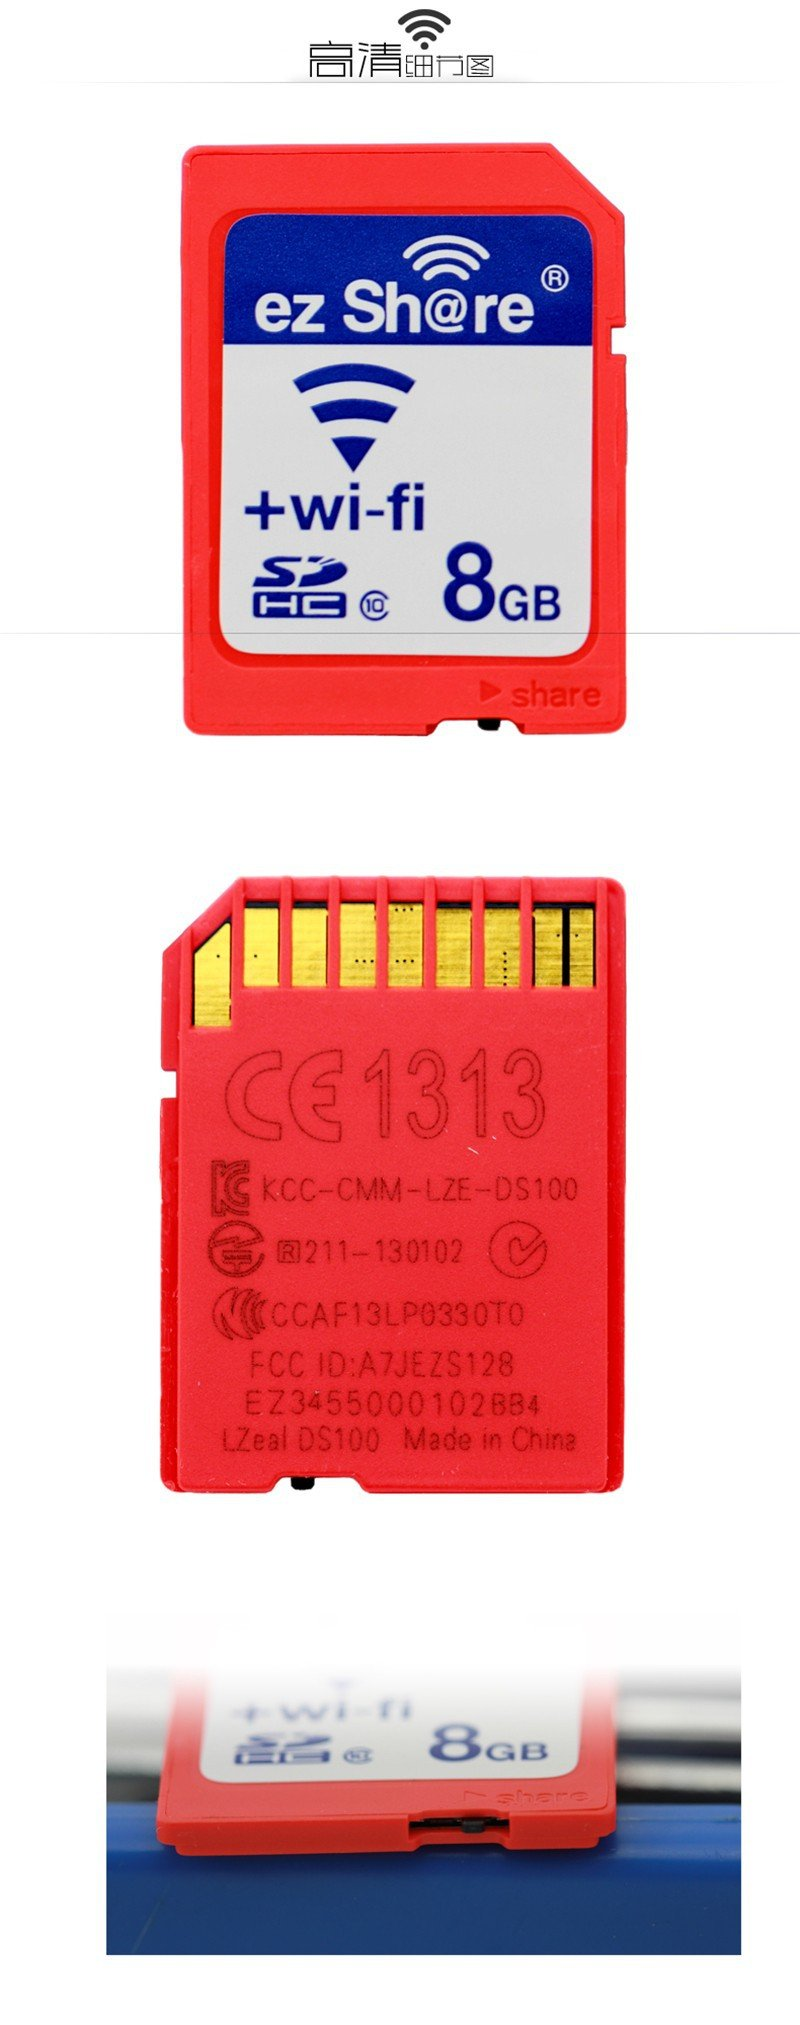 Ez Share WiFi Sd Card Flash 32G Capacity Sdhc Sdxc Memory Sd Card 4G 8G 16G C10 Camera (32GB)